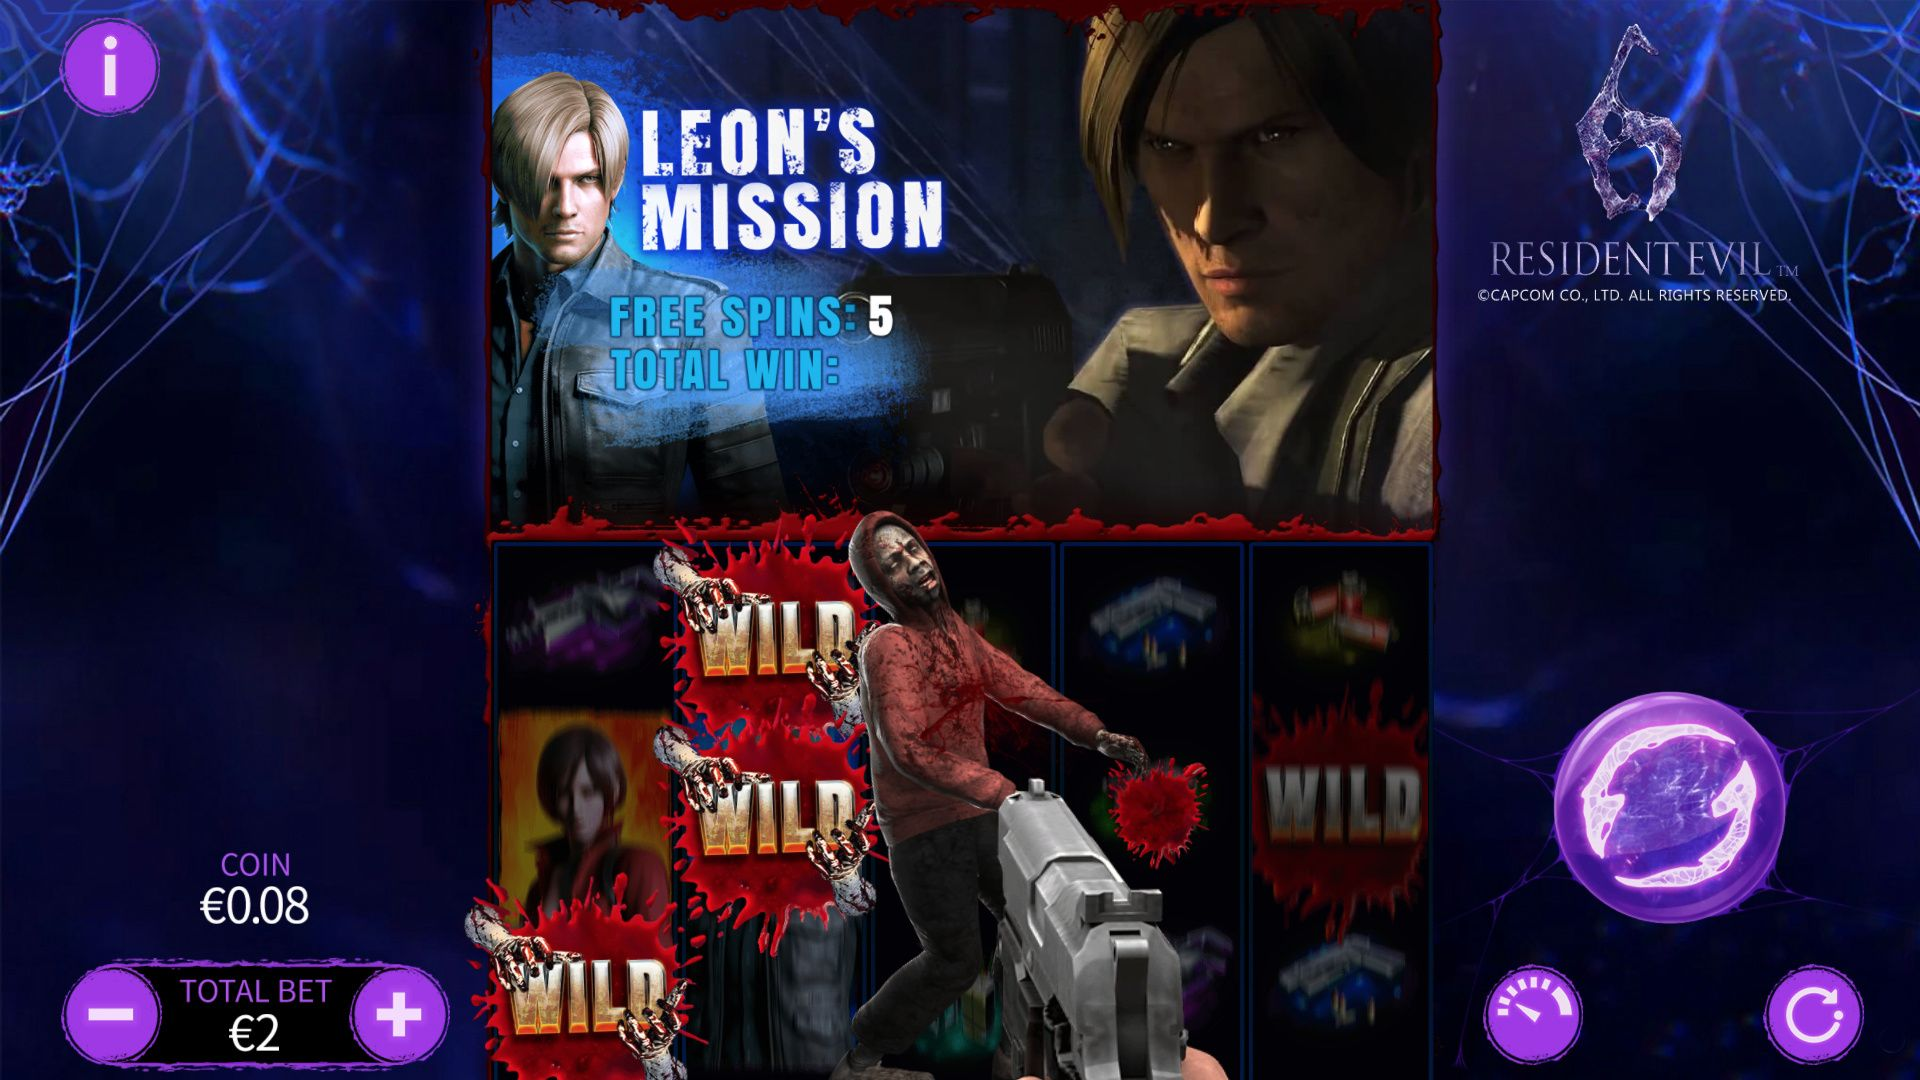 Leon's Mission: Sticky Wild Zombies